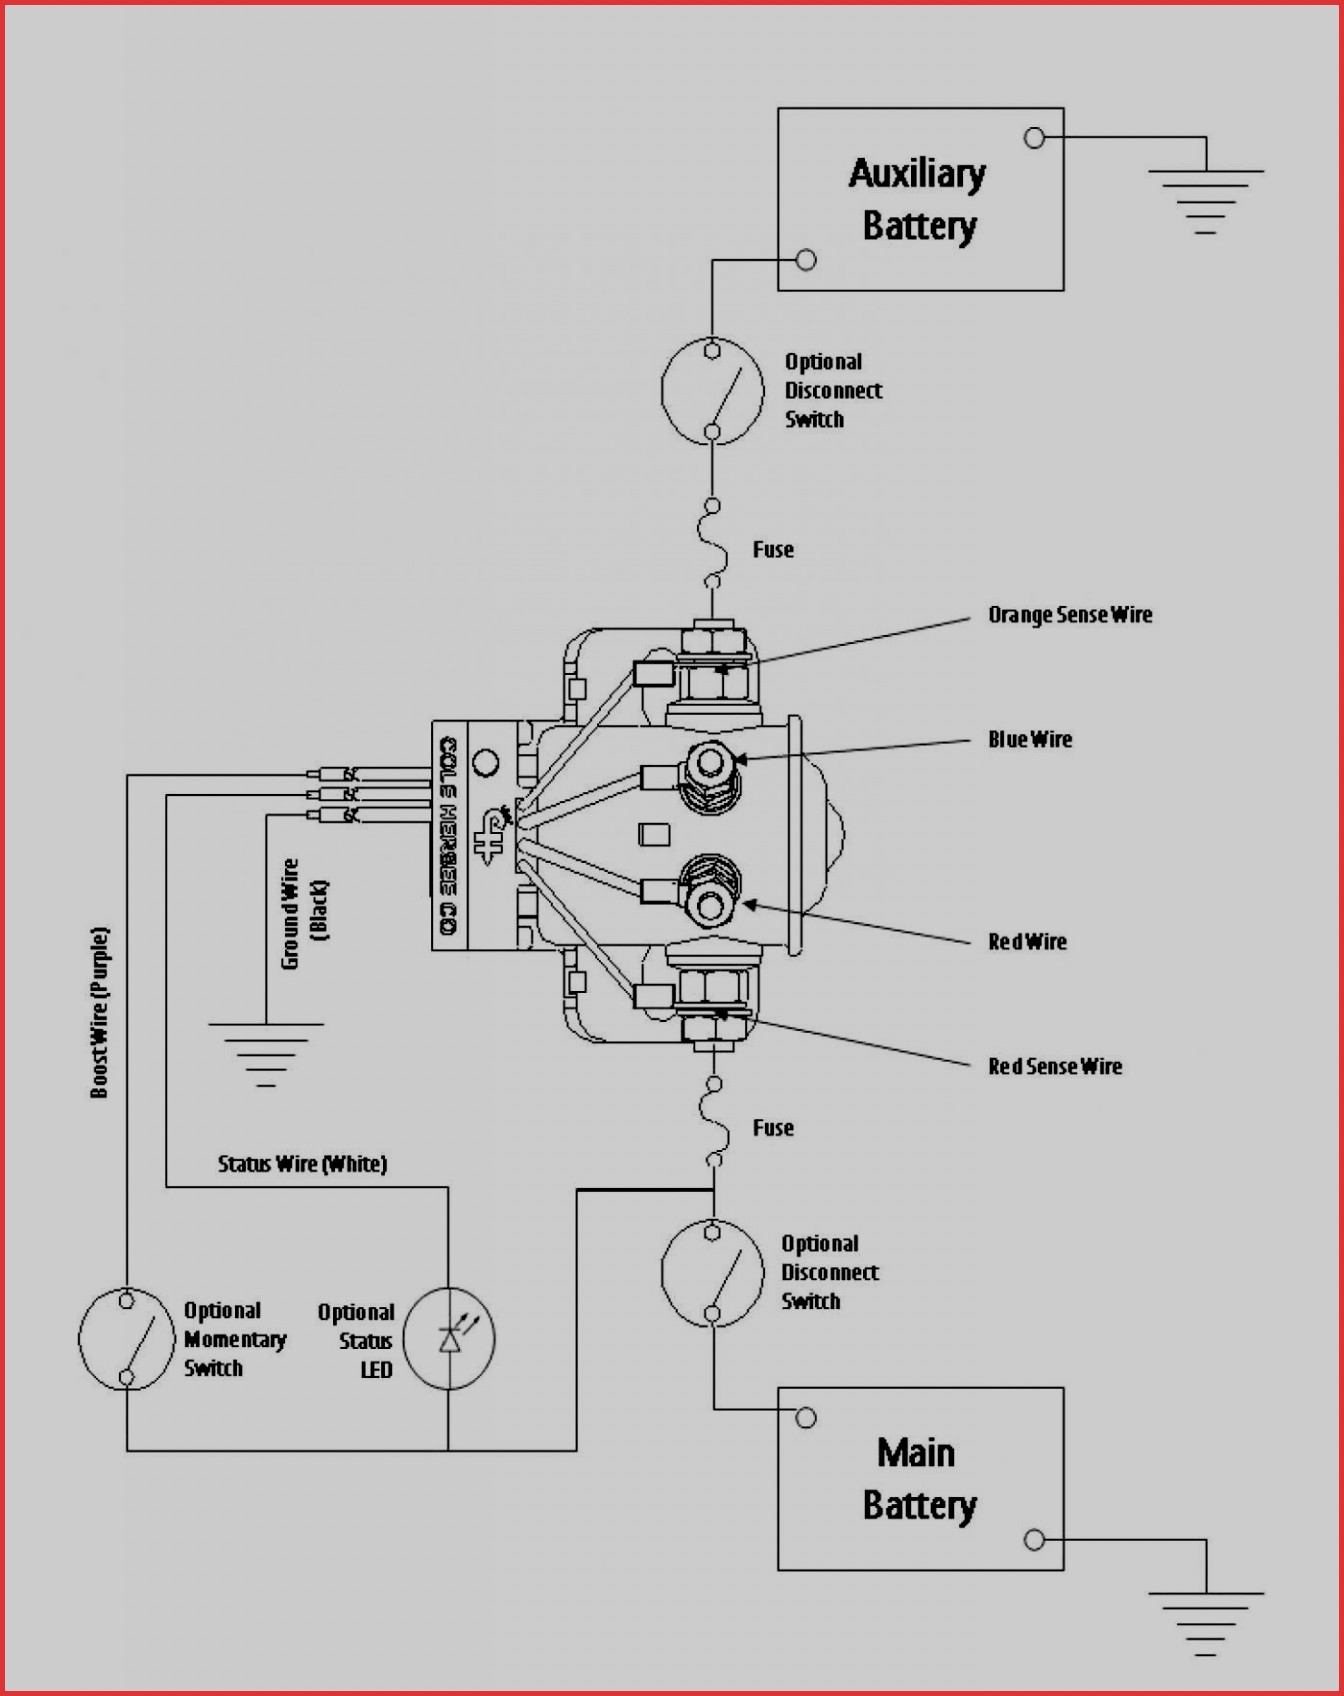 jayco wiring harness wiring diagram dejayco wiring harness diagram library wiring diagram coleman camper wiring harness